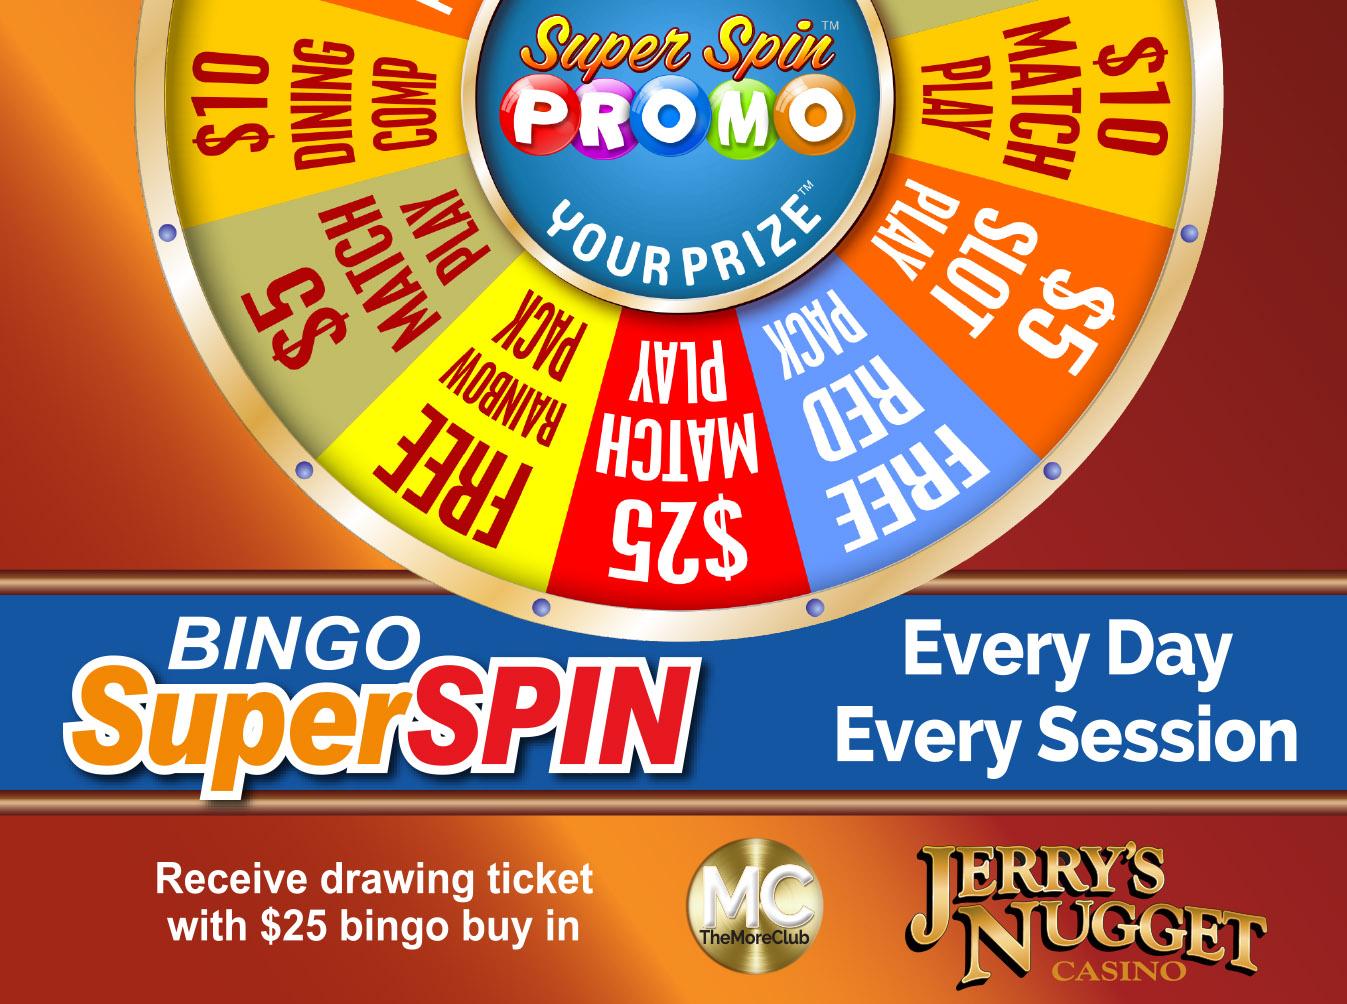 Bingo Super Spin Prizes